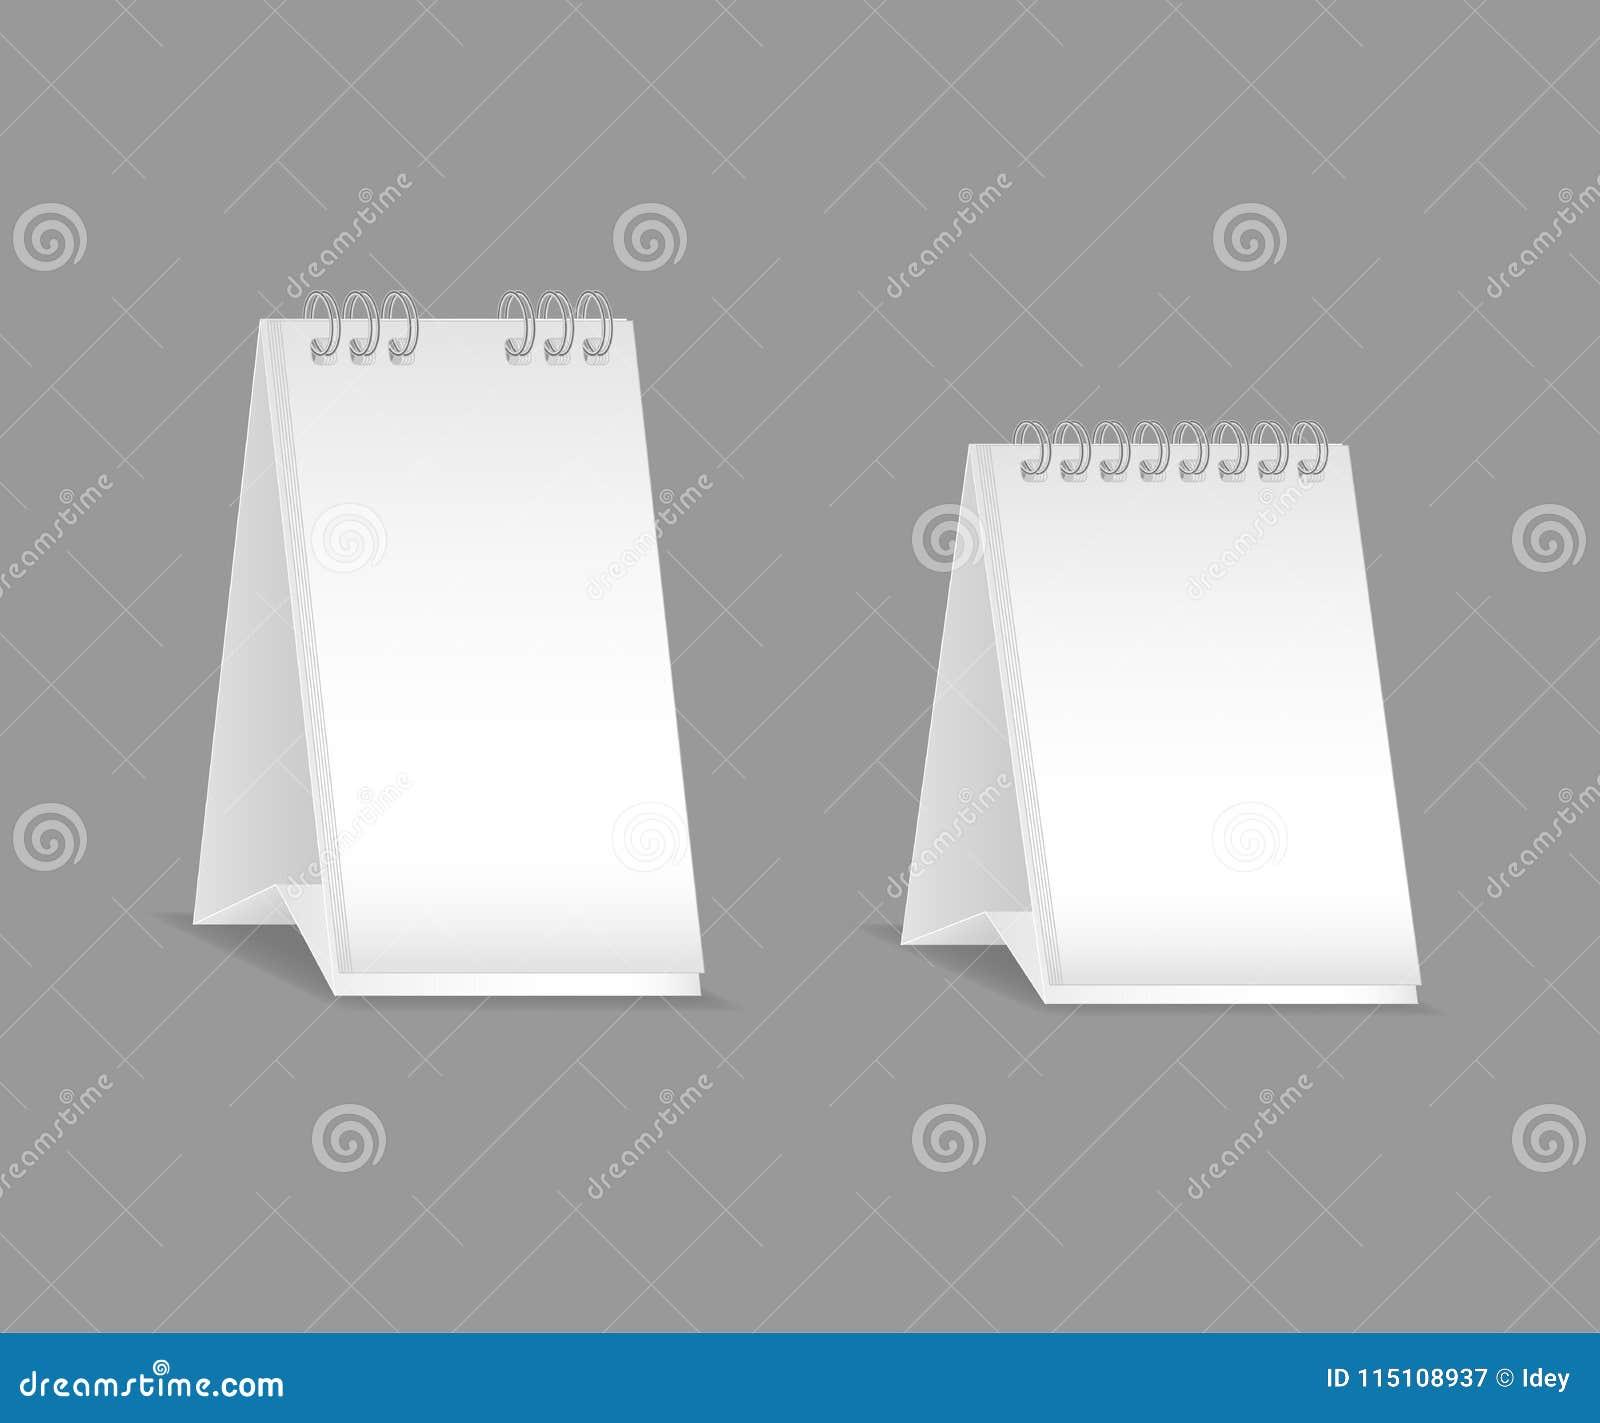 Template, Layout, Beautiful Realistic Notebook. Empty White ...